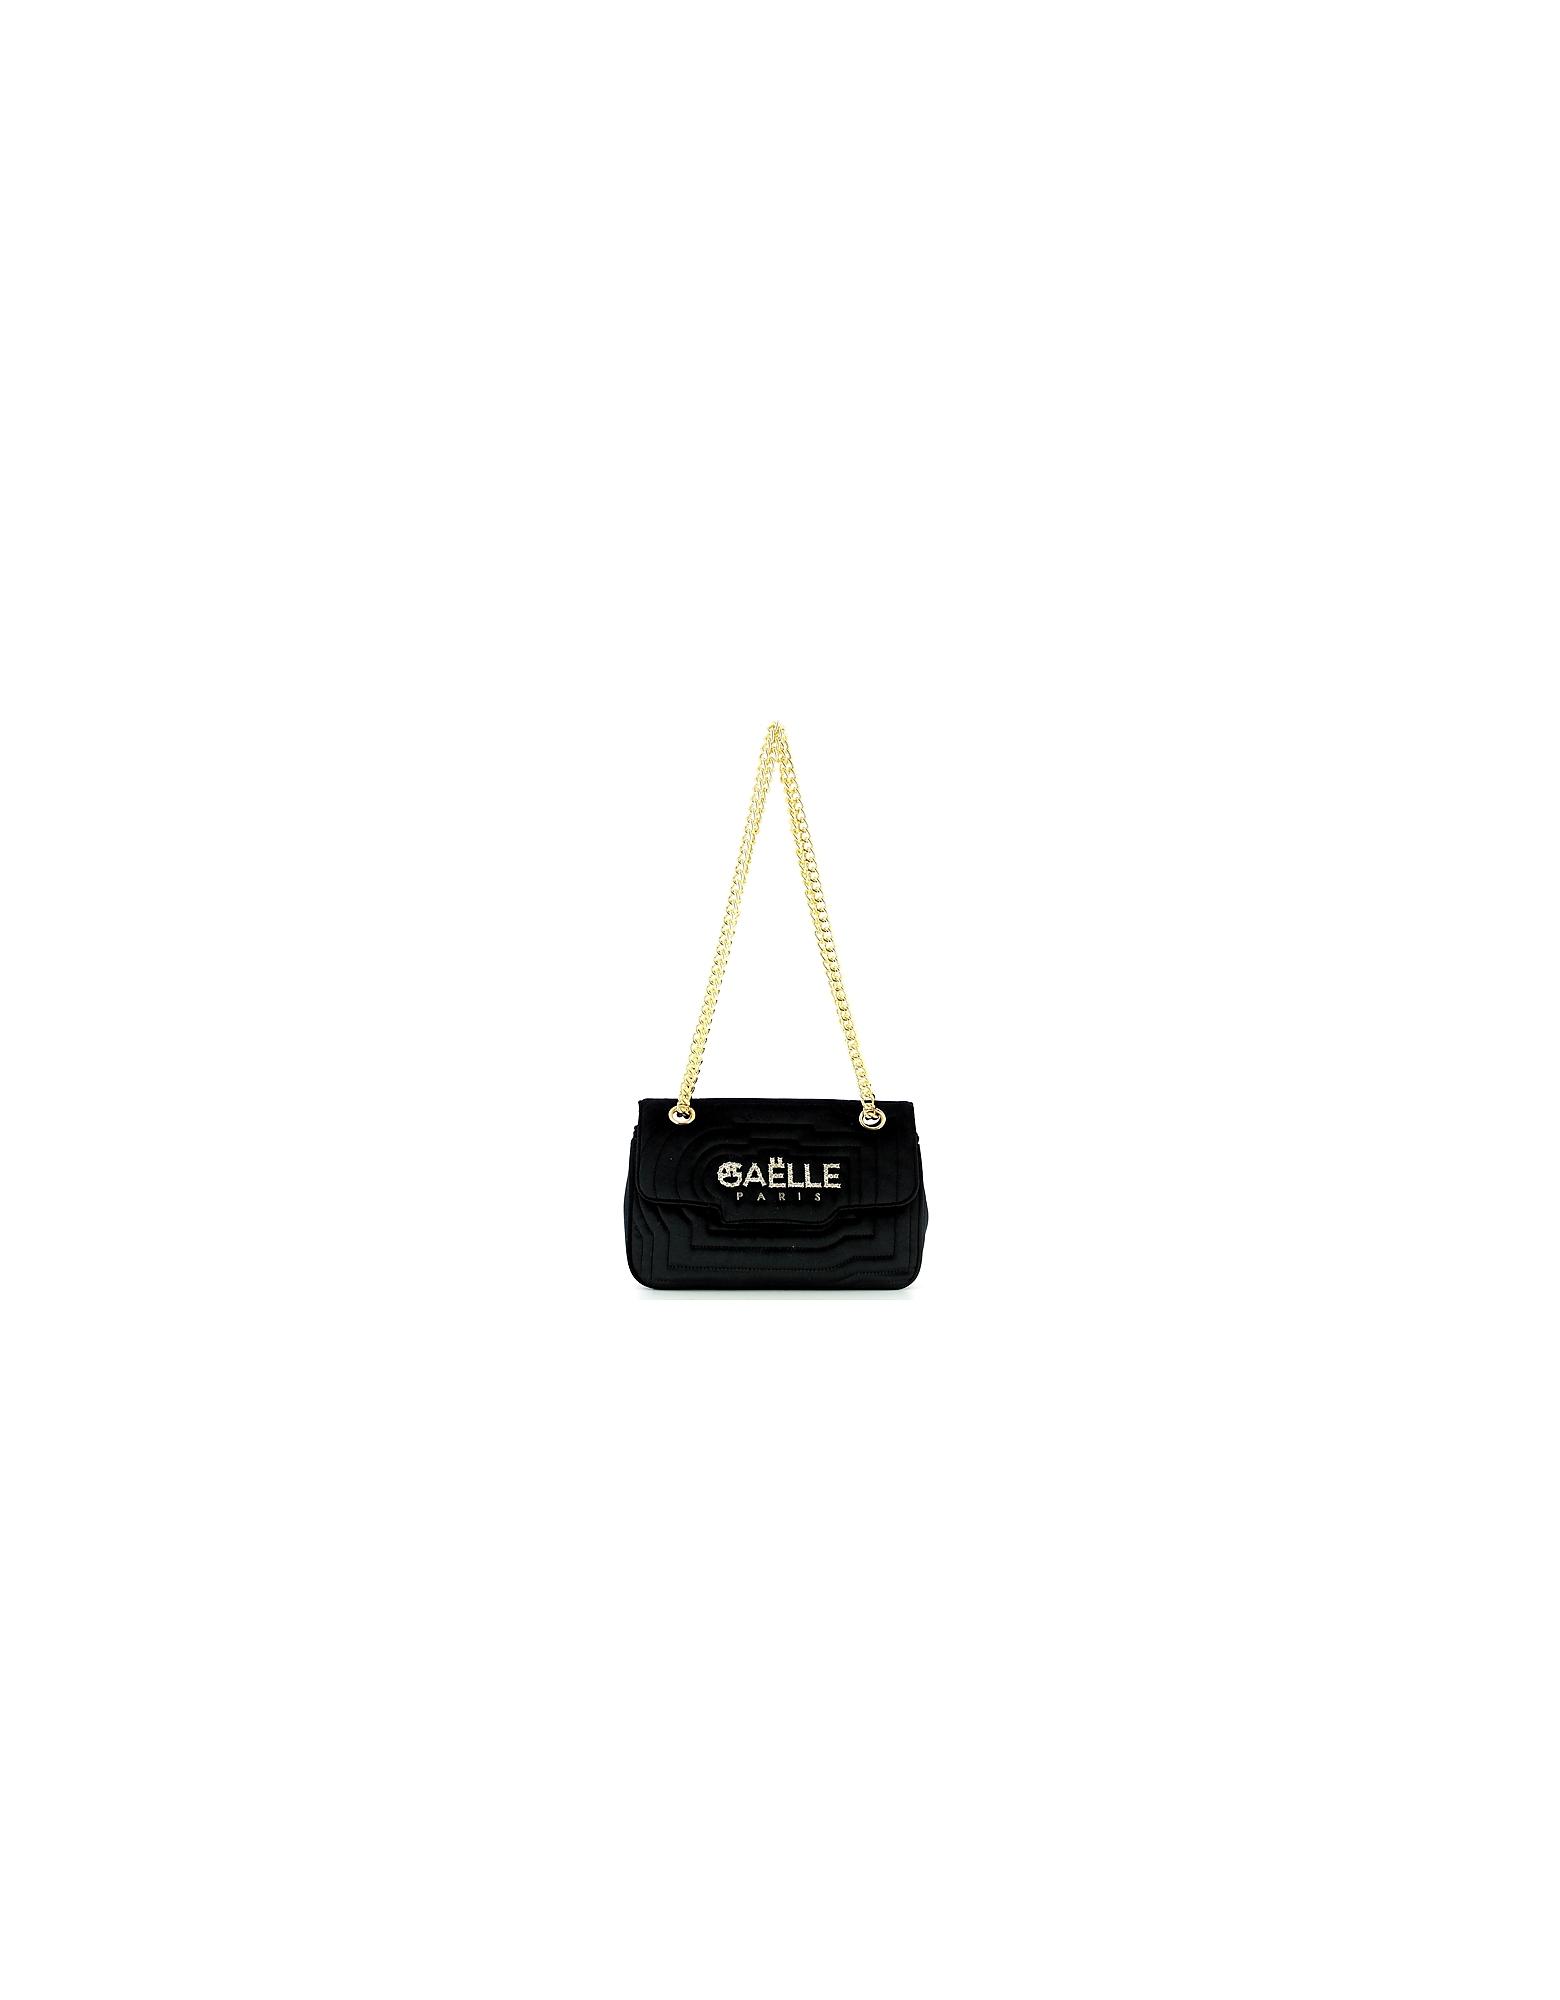 GAELLE PARIS Designer Handbags, Women's Black Bag